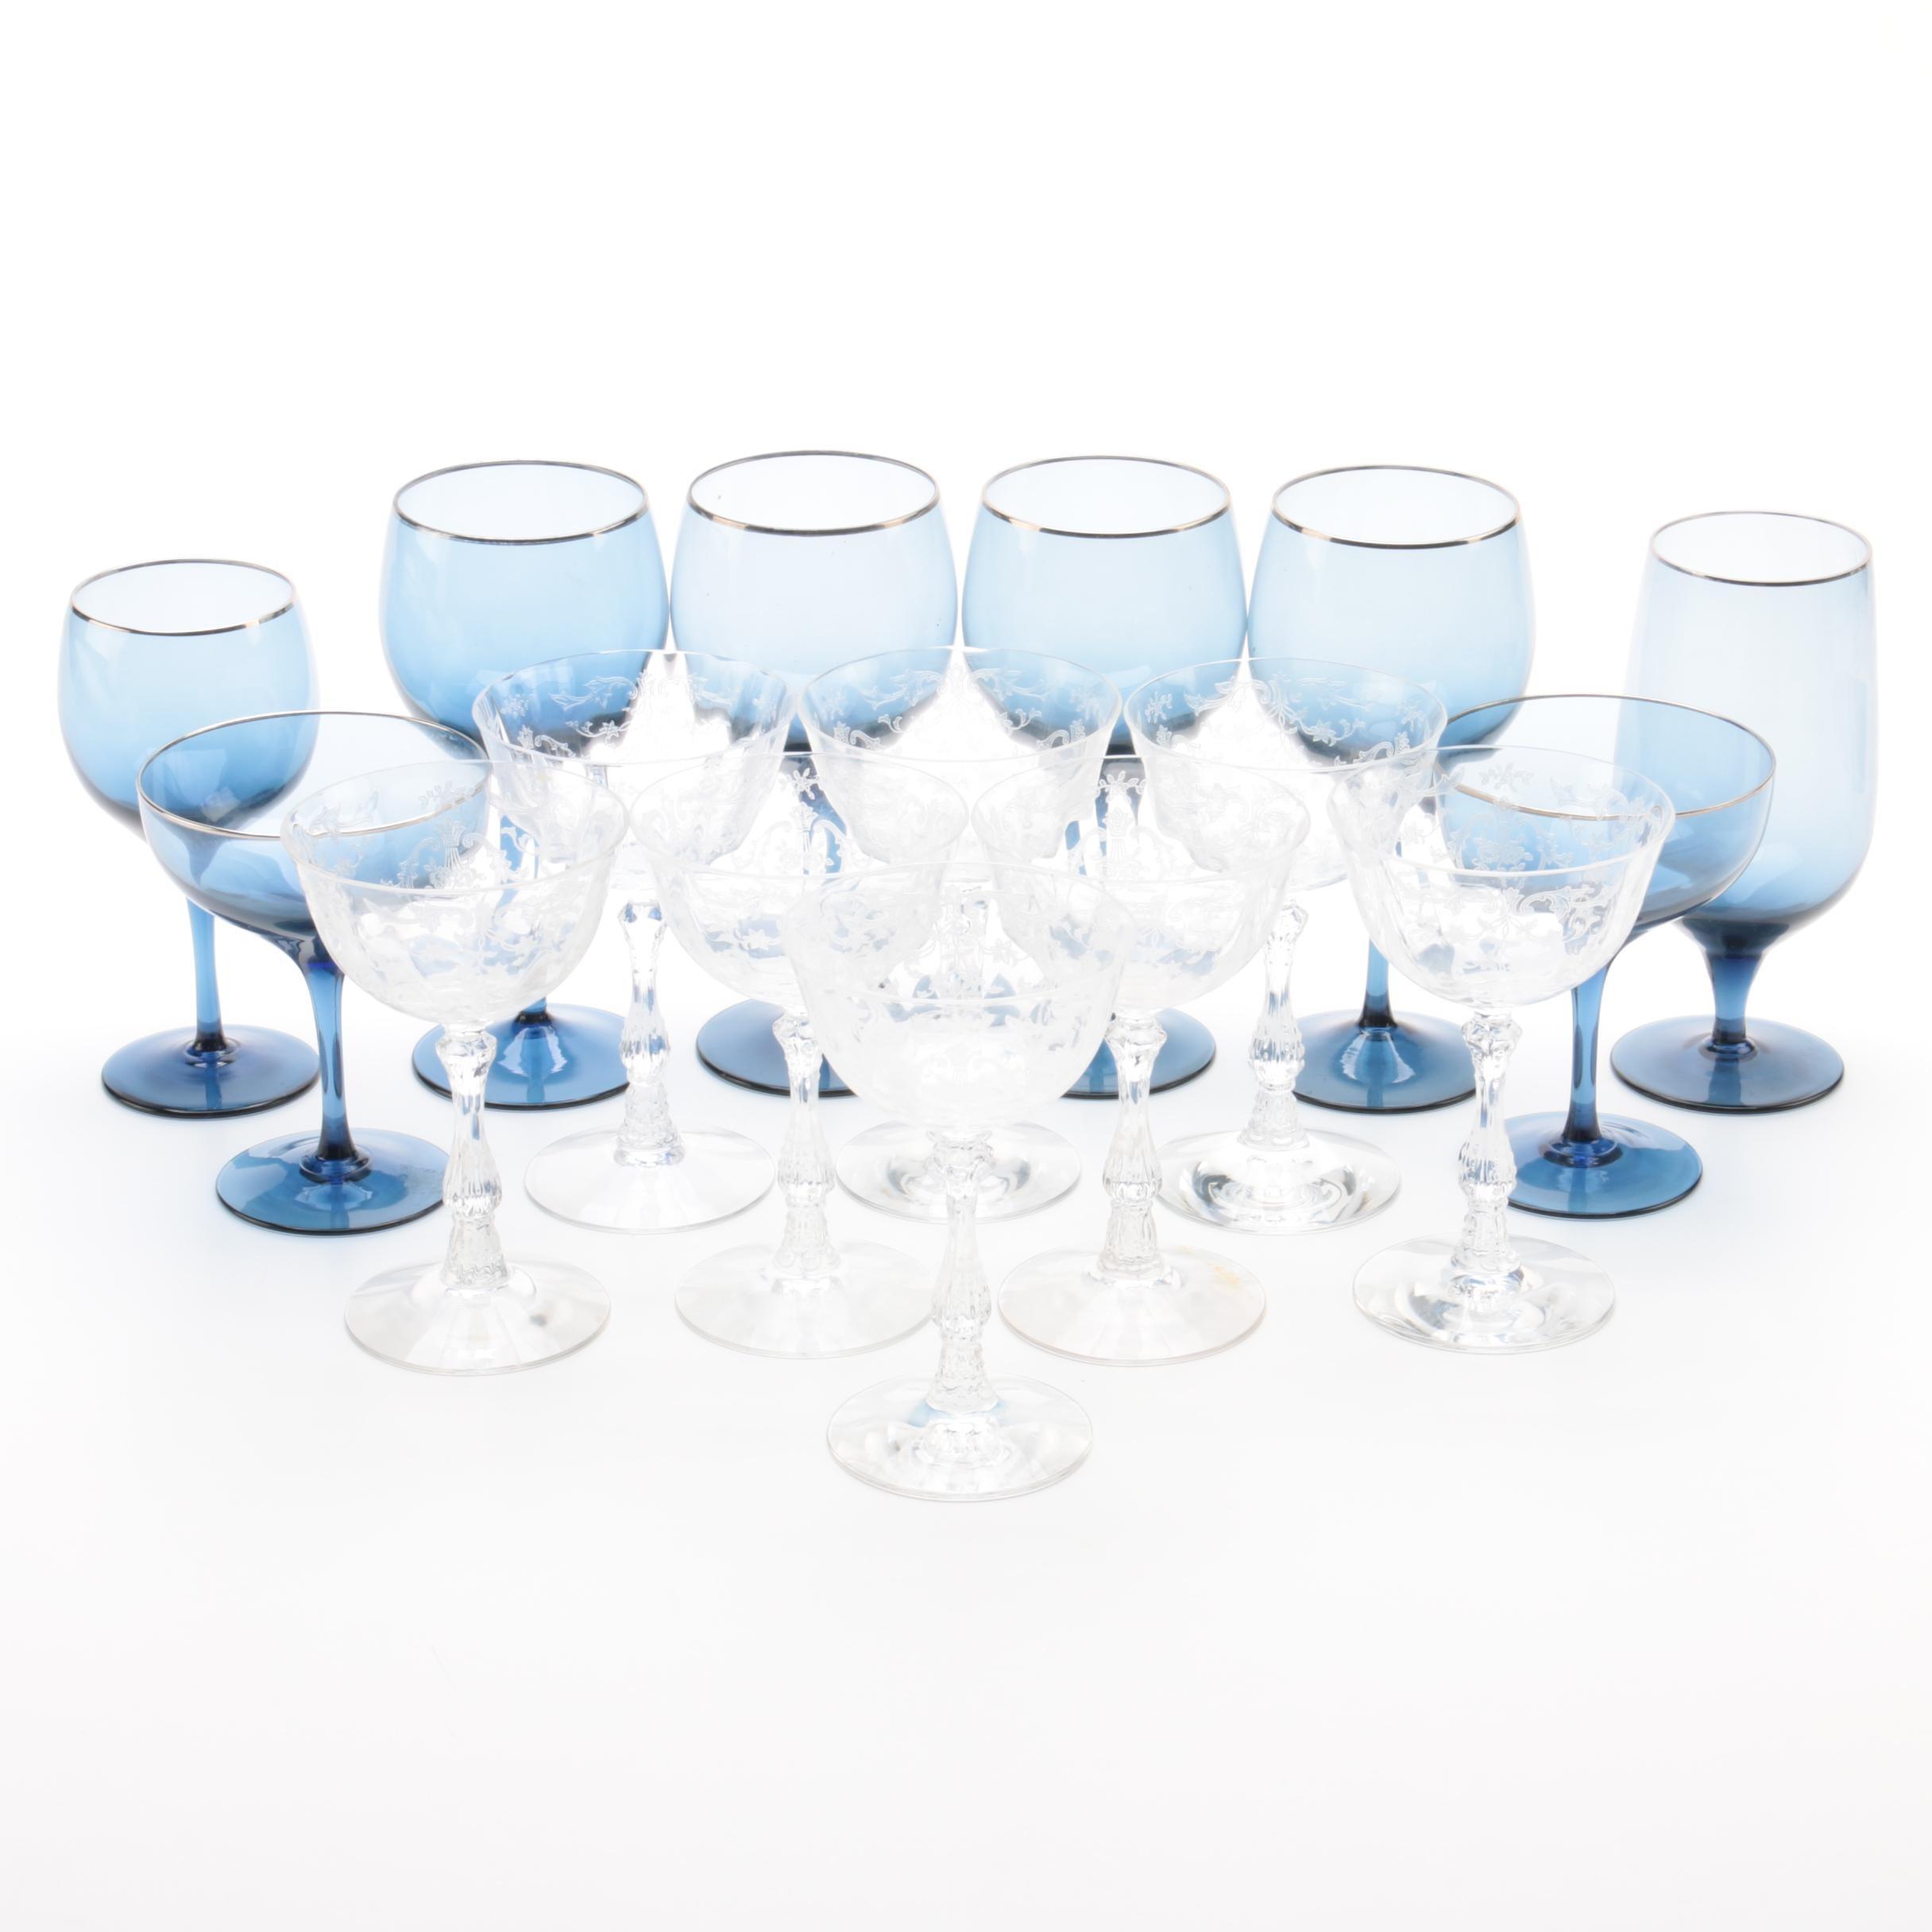 "Lenox ""Blue Shadow"" and Fostoria Etched Glass Stemware"